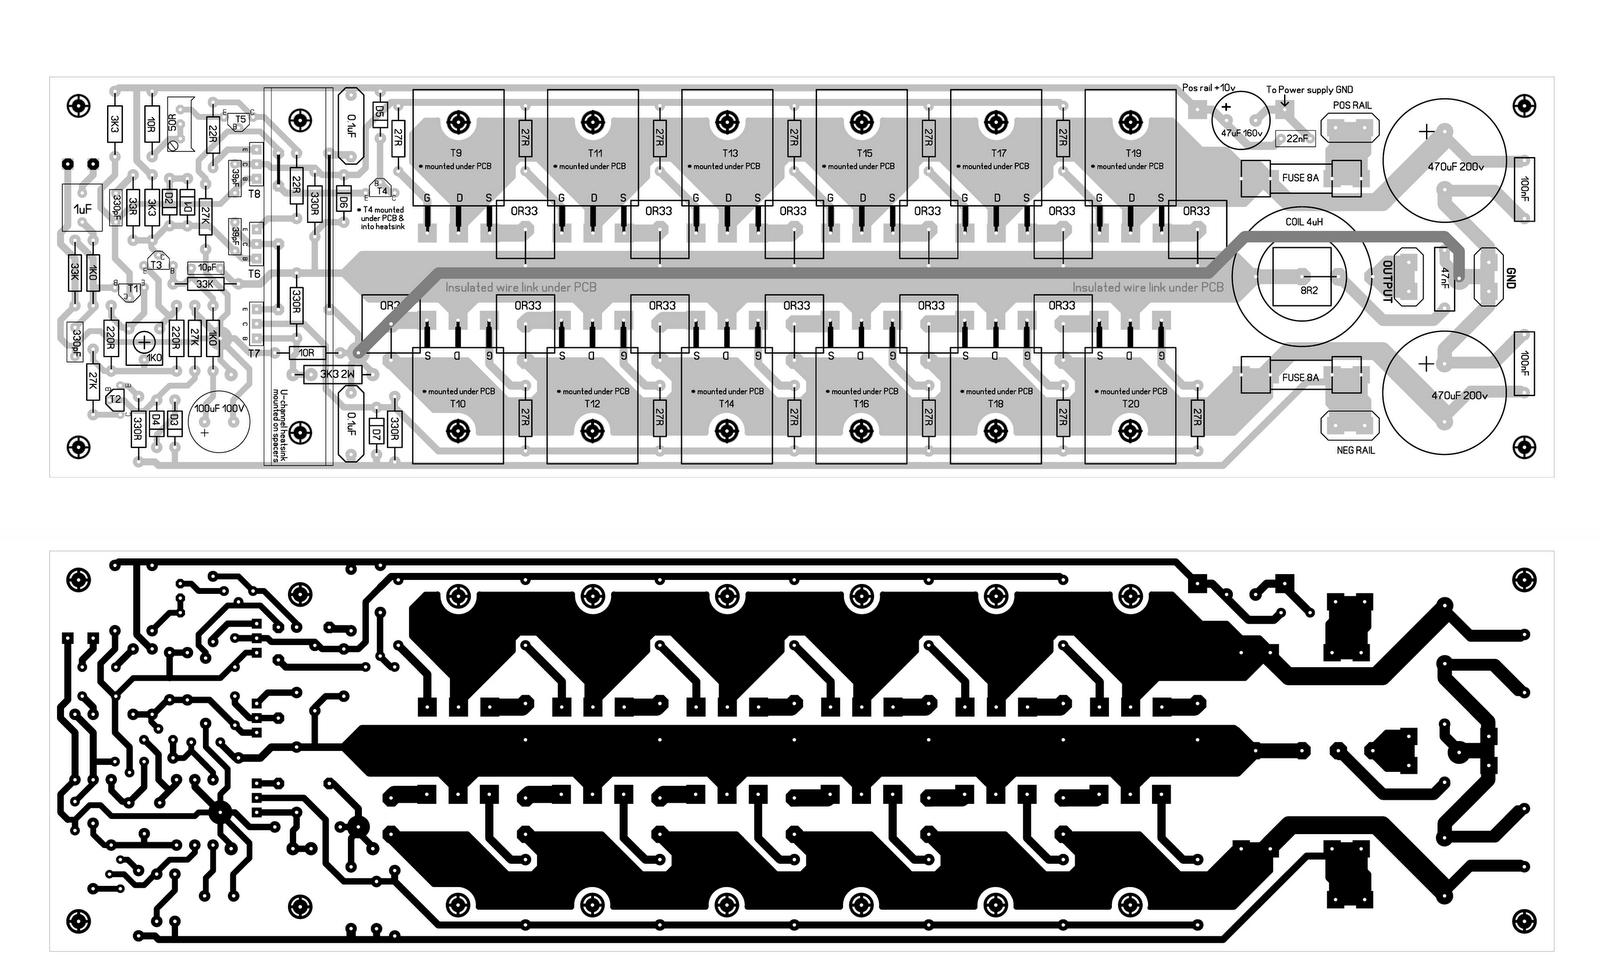 5000 Watt Amplifier Circuit Diagram Wire Watts Diagrams Wiring Library